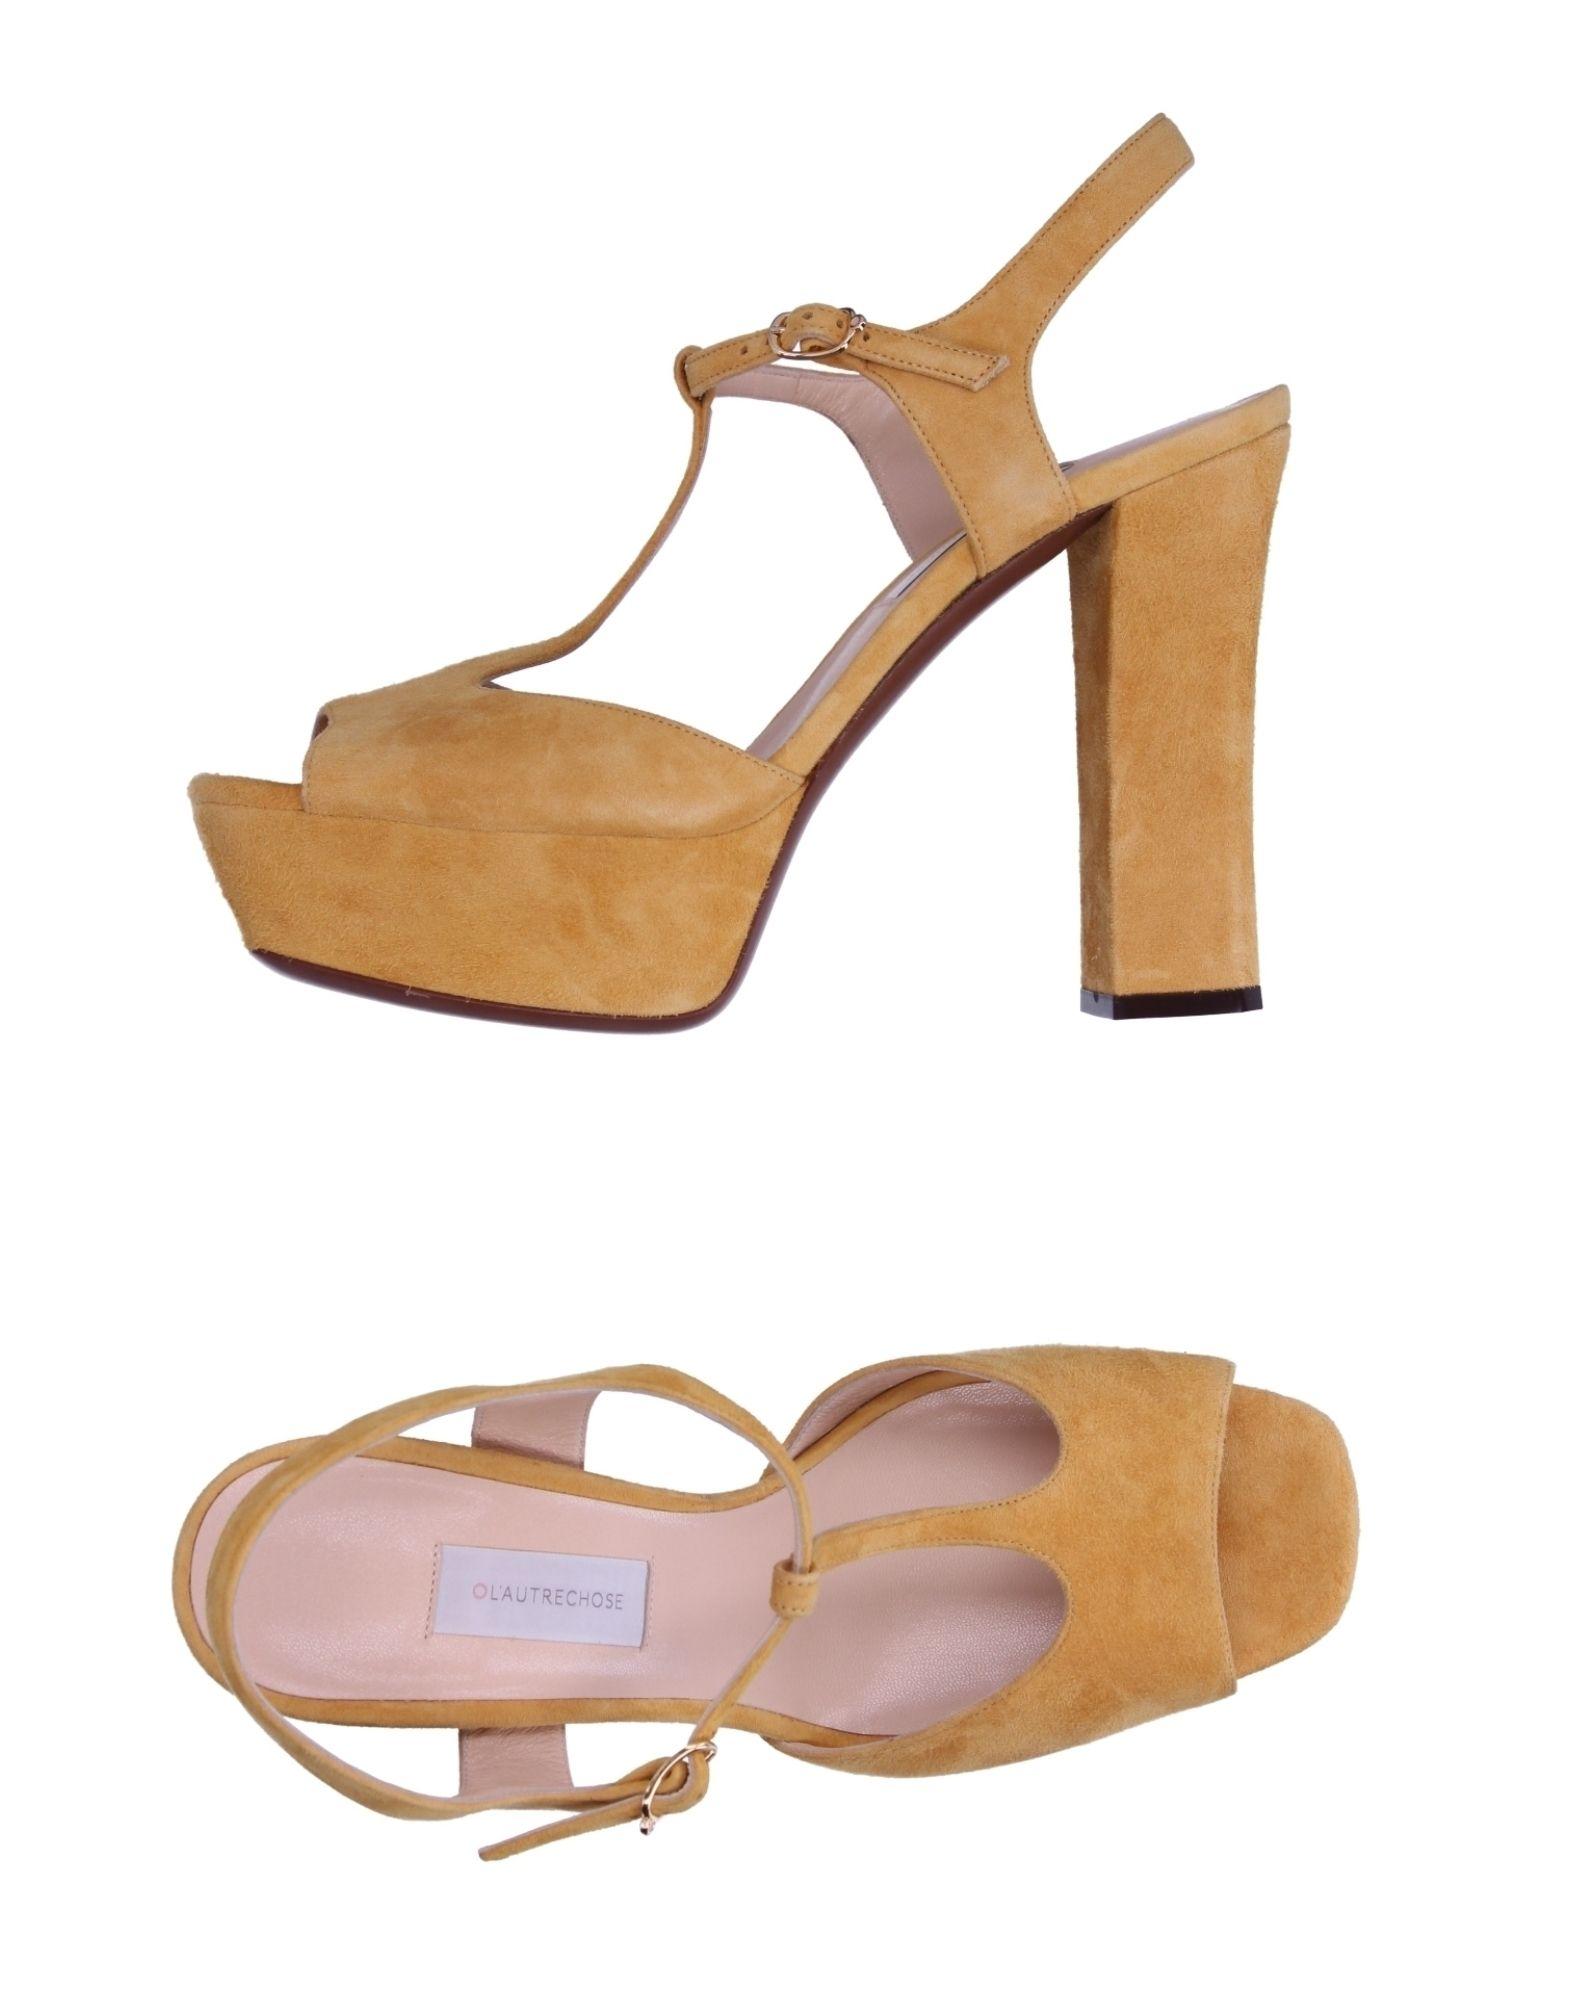 L' Autre Chose Sandalen Qualität Damen  11152716OQ Gute Qualität Sandalen beliebte Schuhe 3c6152